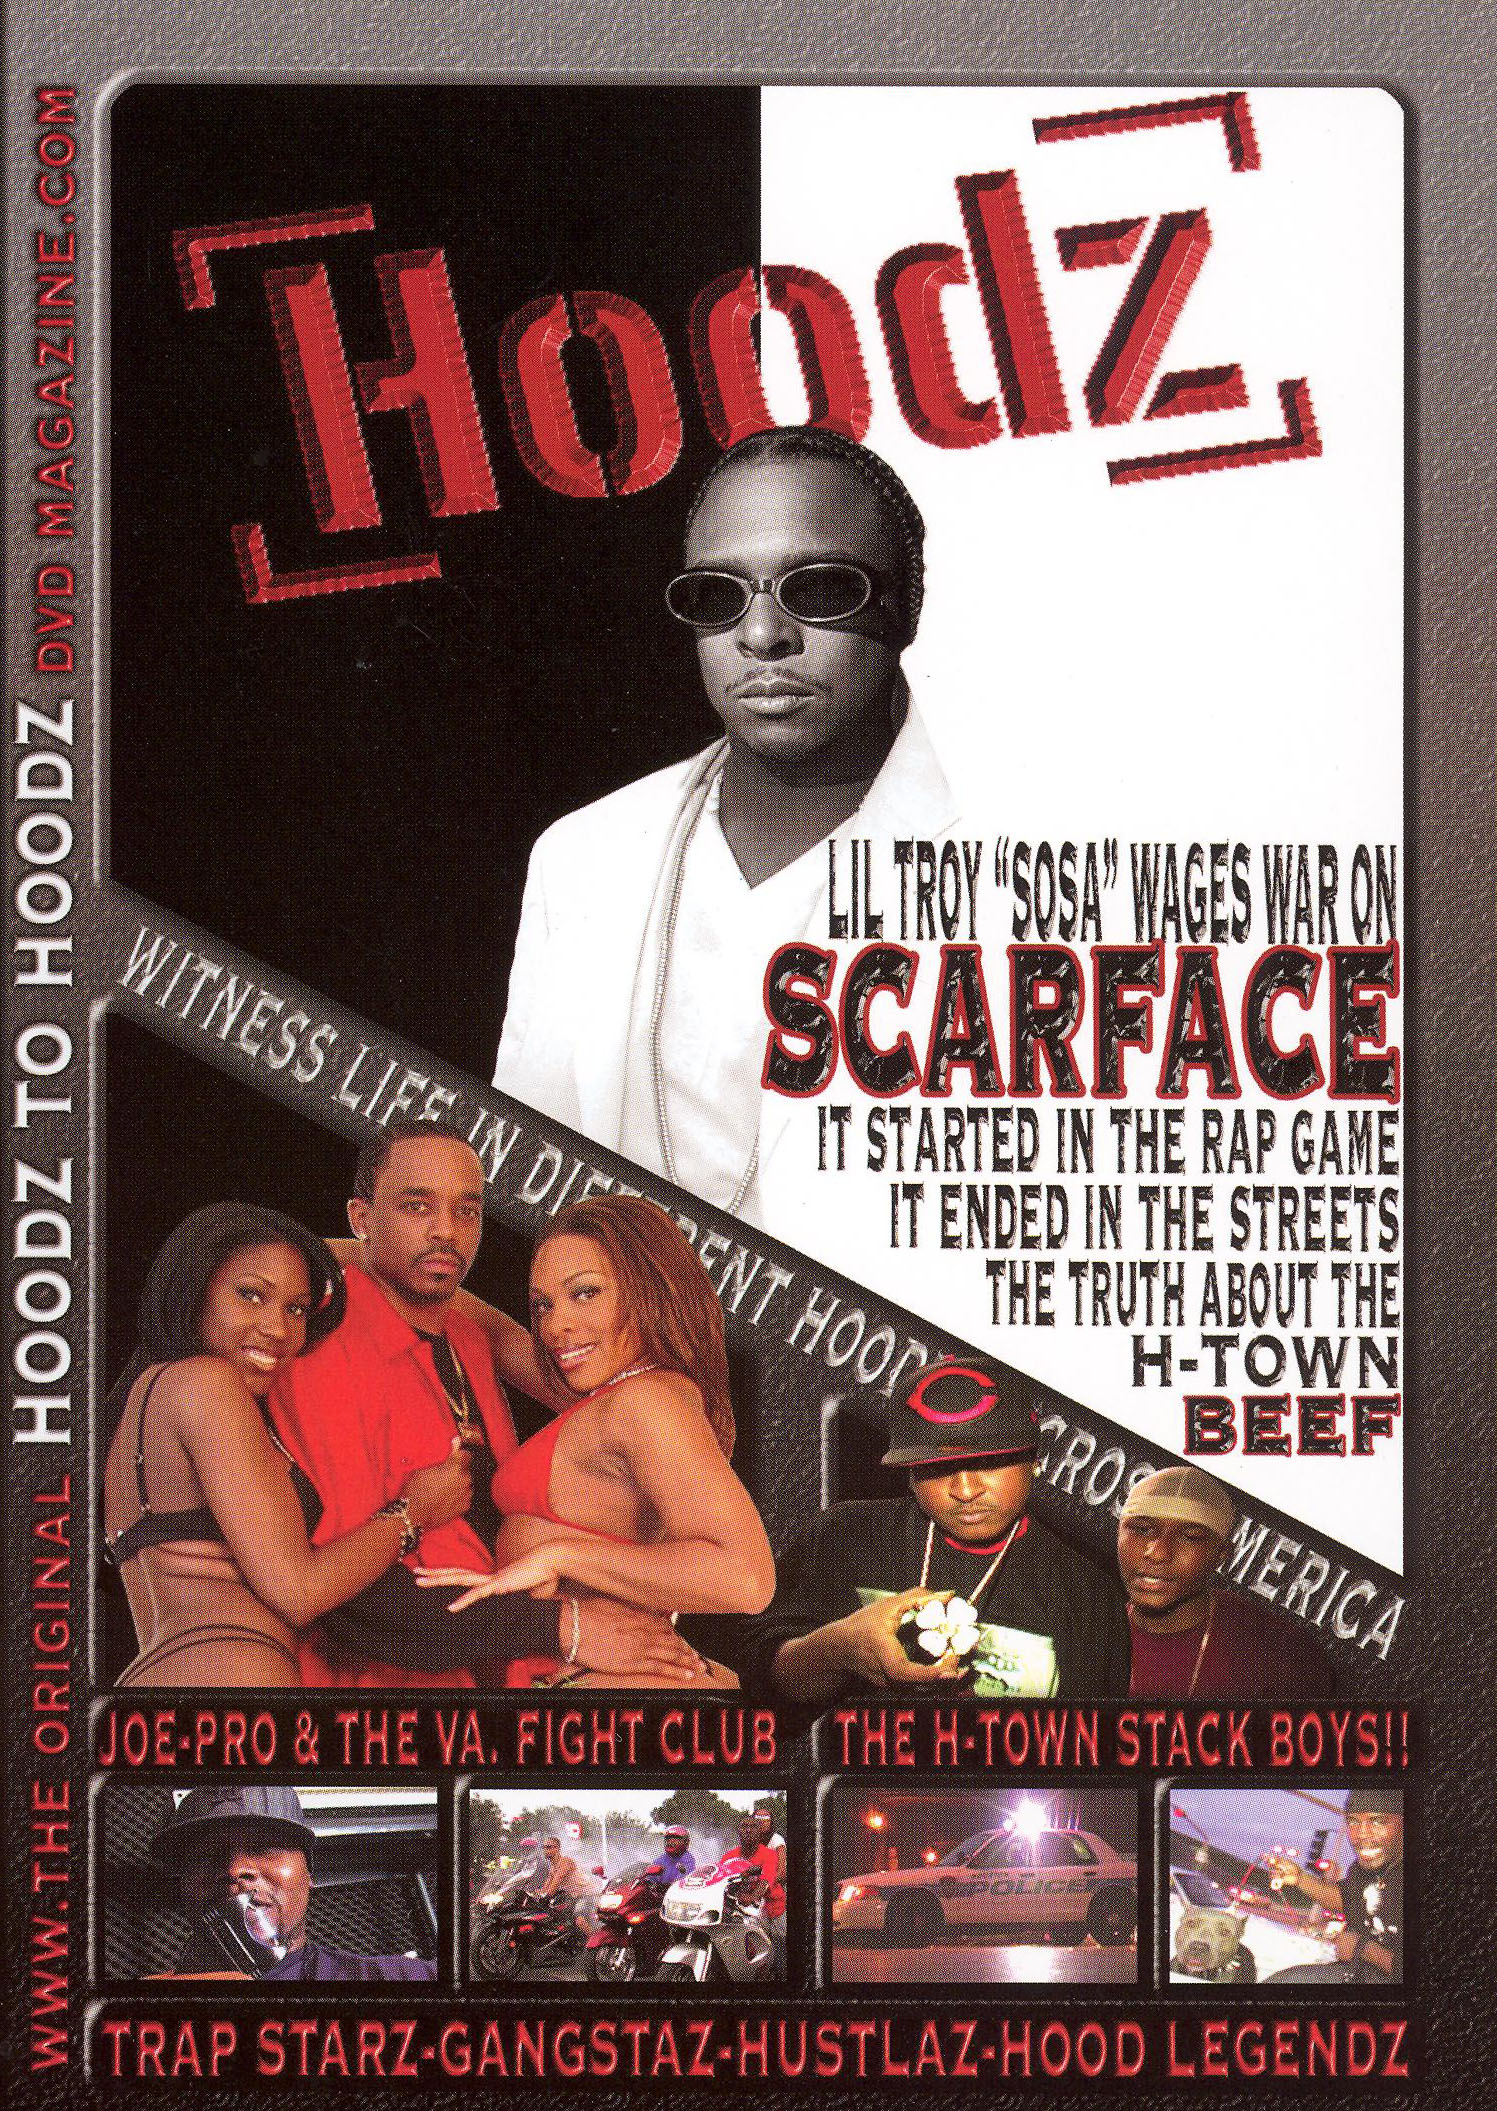 Hoodz DVD: Scarface